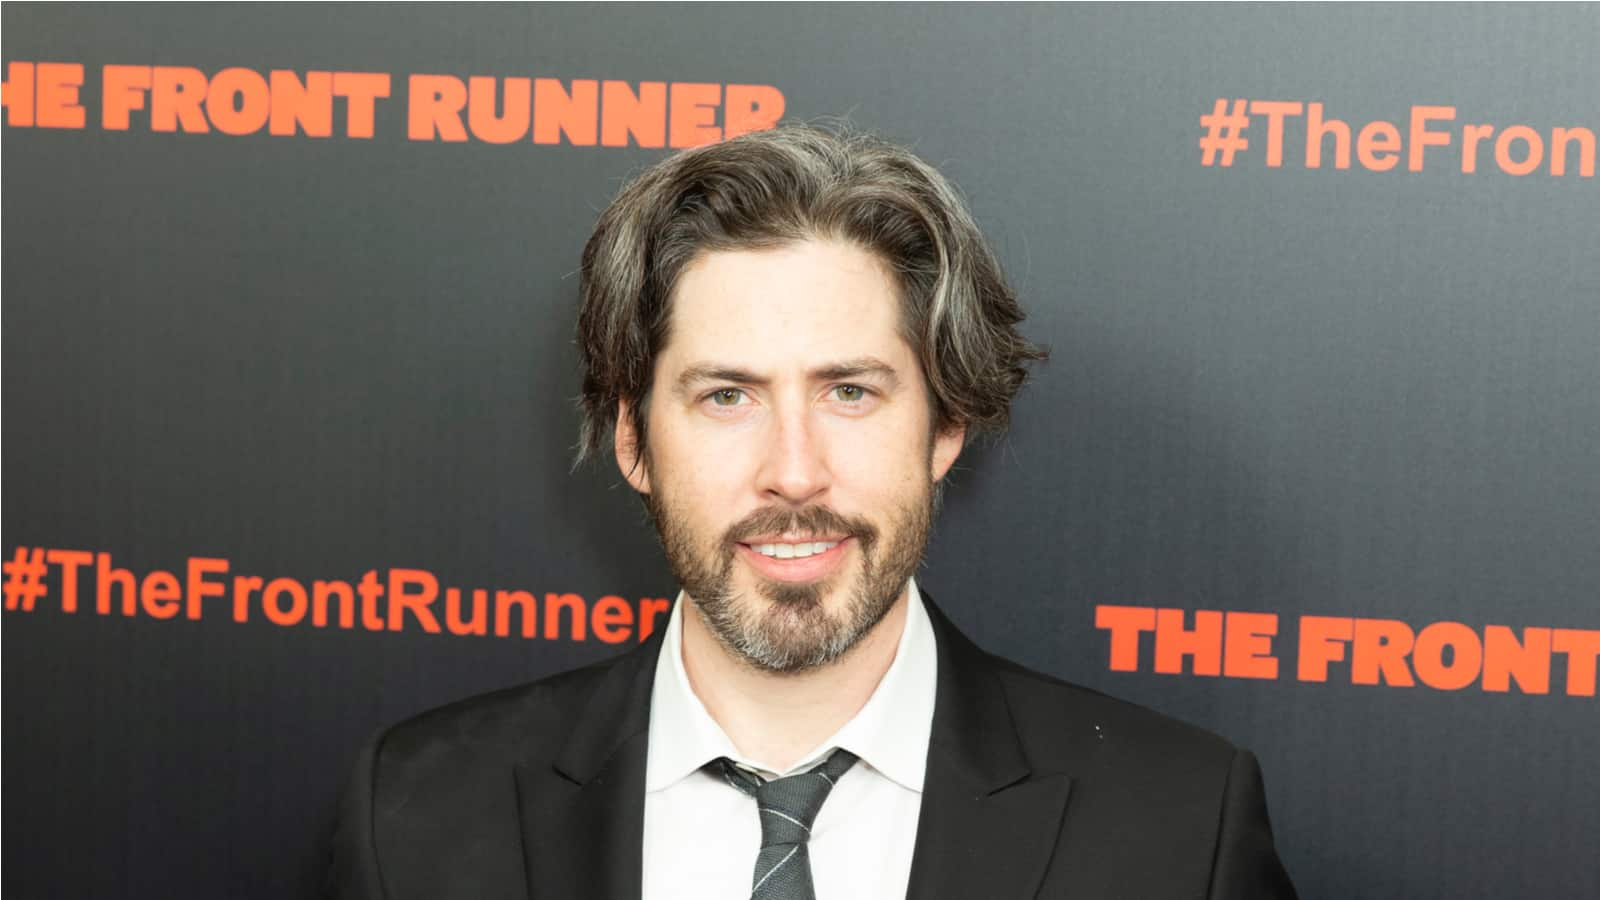 Jason Reitman attends premiere The Front Runner at Museum of Modern Art